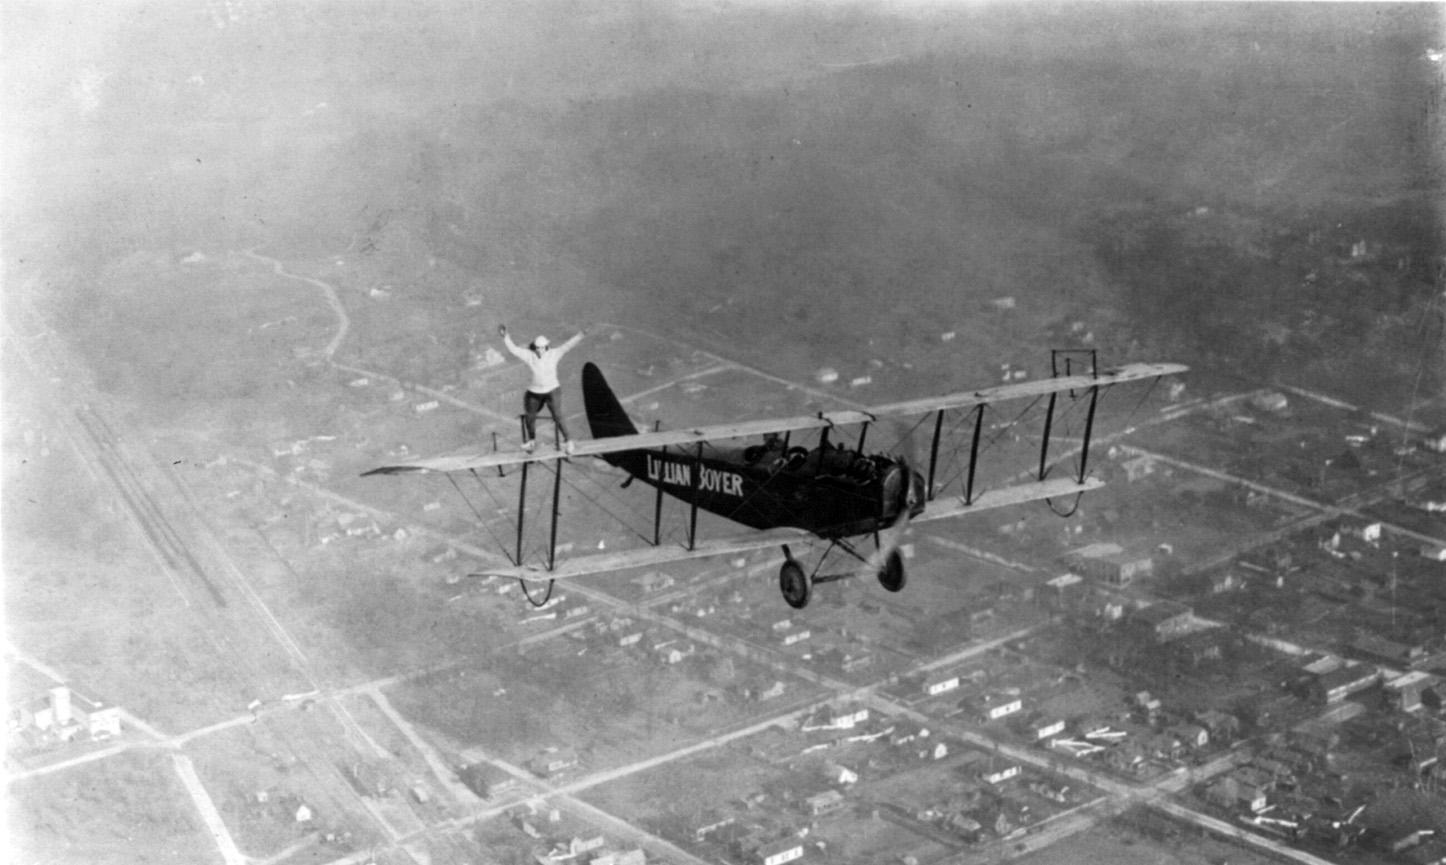 Lillian_Boyer_standing_on_wing_of_plane_cph.3b18663.jpg